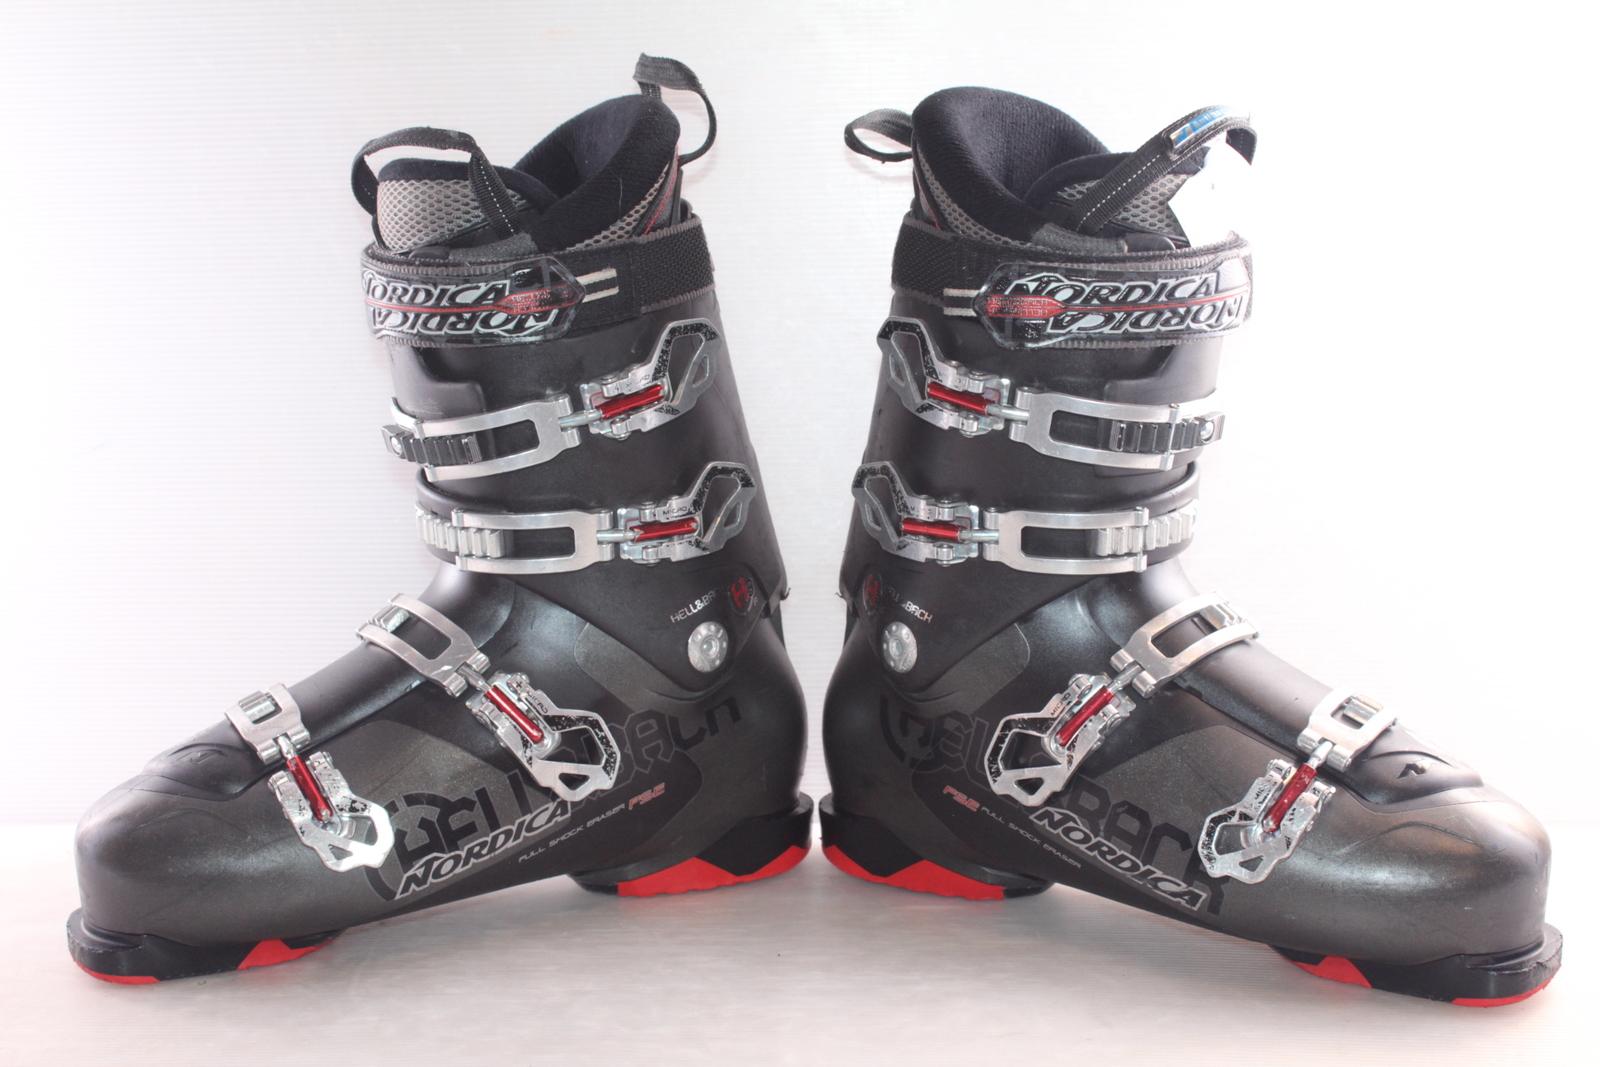 Lyžařské boty Nordica Hell and back H3R vel. EU46.5 flexe 90